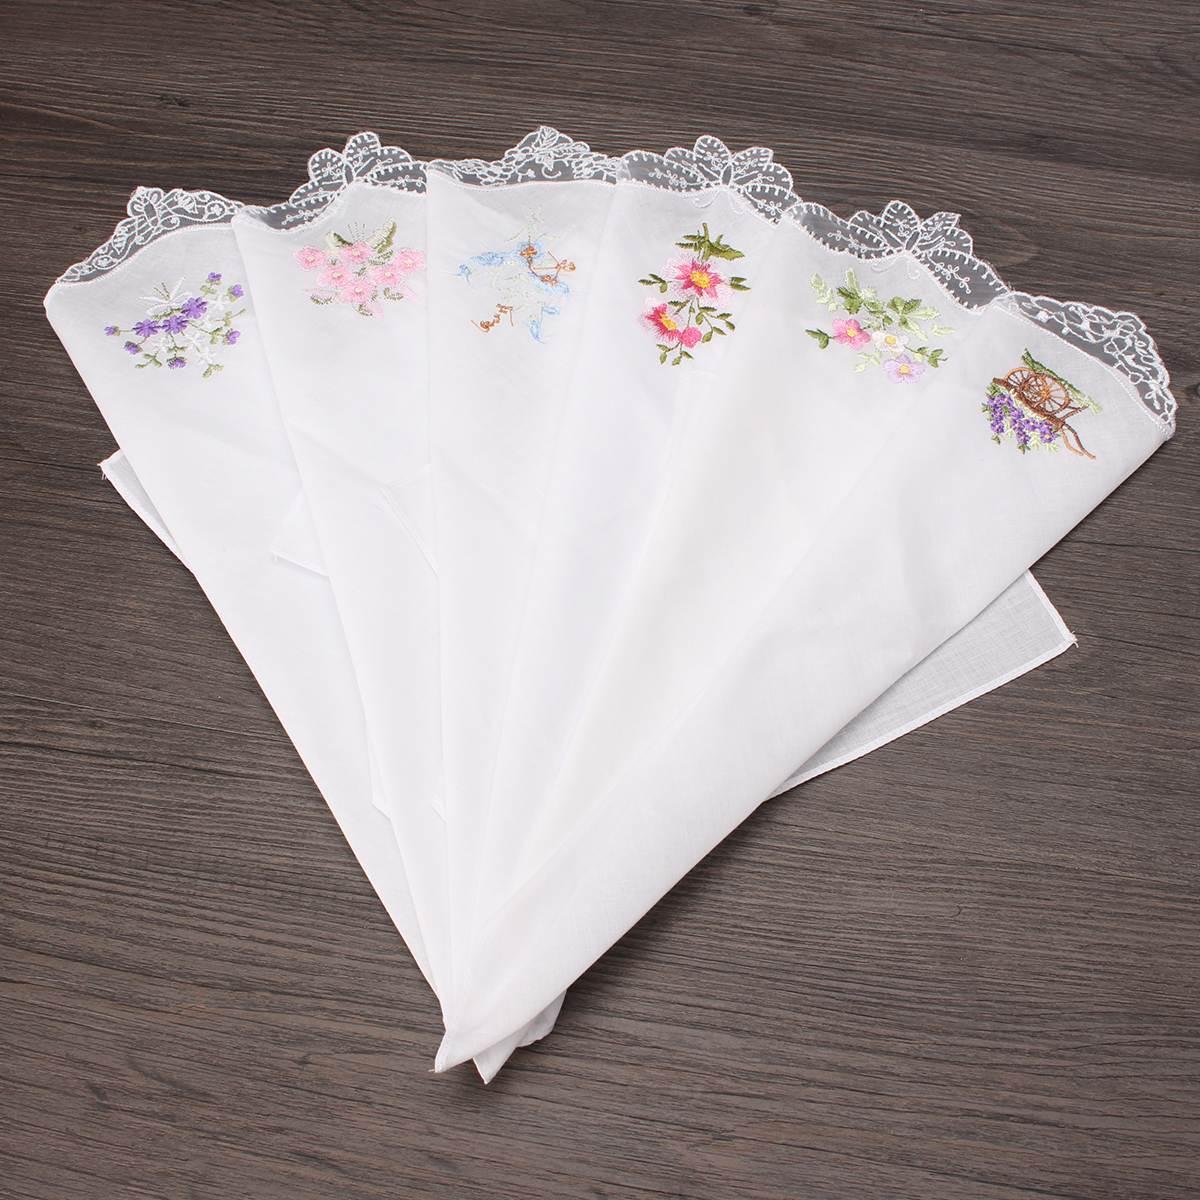 6 Pcs/lot 100% Cotton Flower Handkerchiefs For Women 28*28cm Napkin Embroidered Floral Wash Hand Square Towels Ladies Lace Hanky